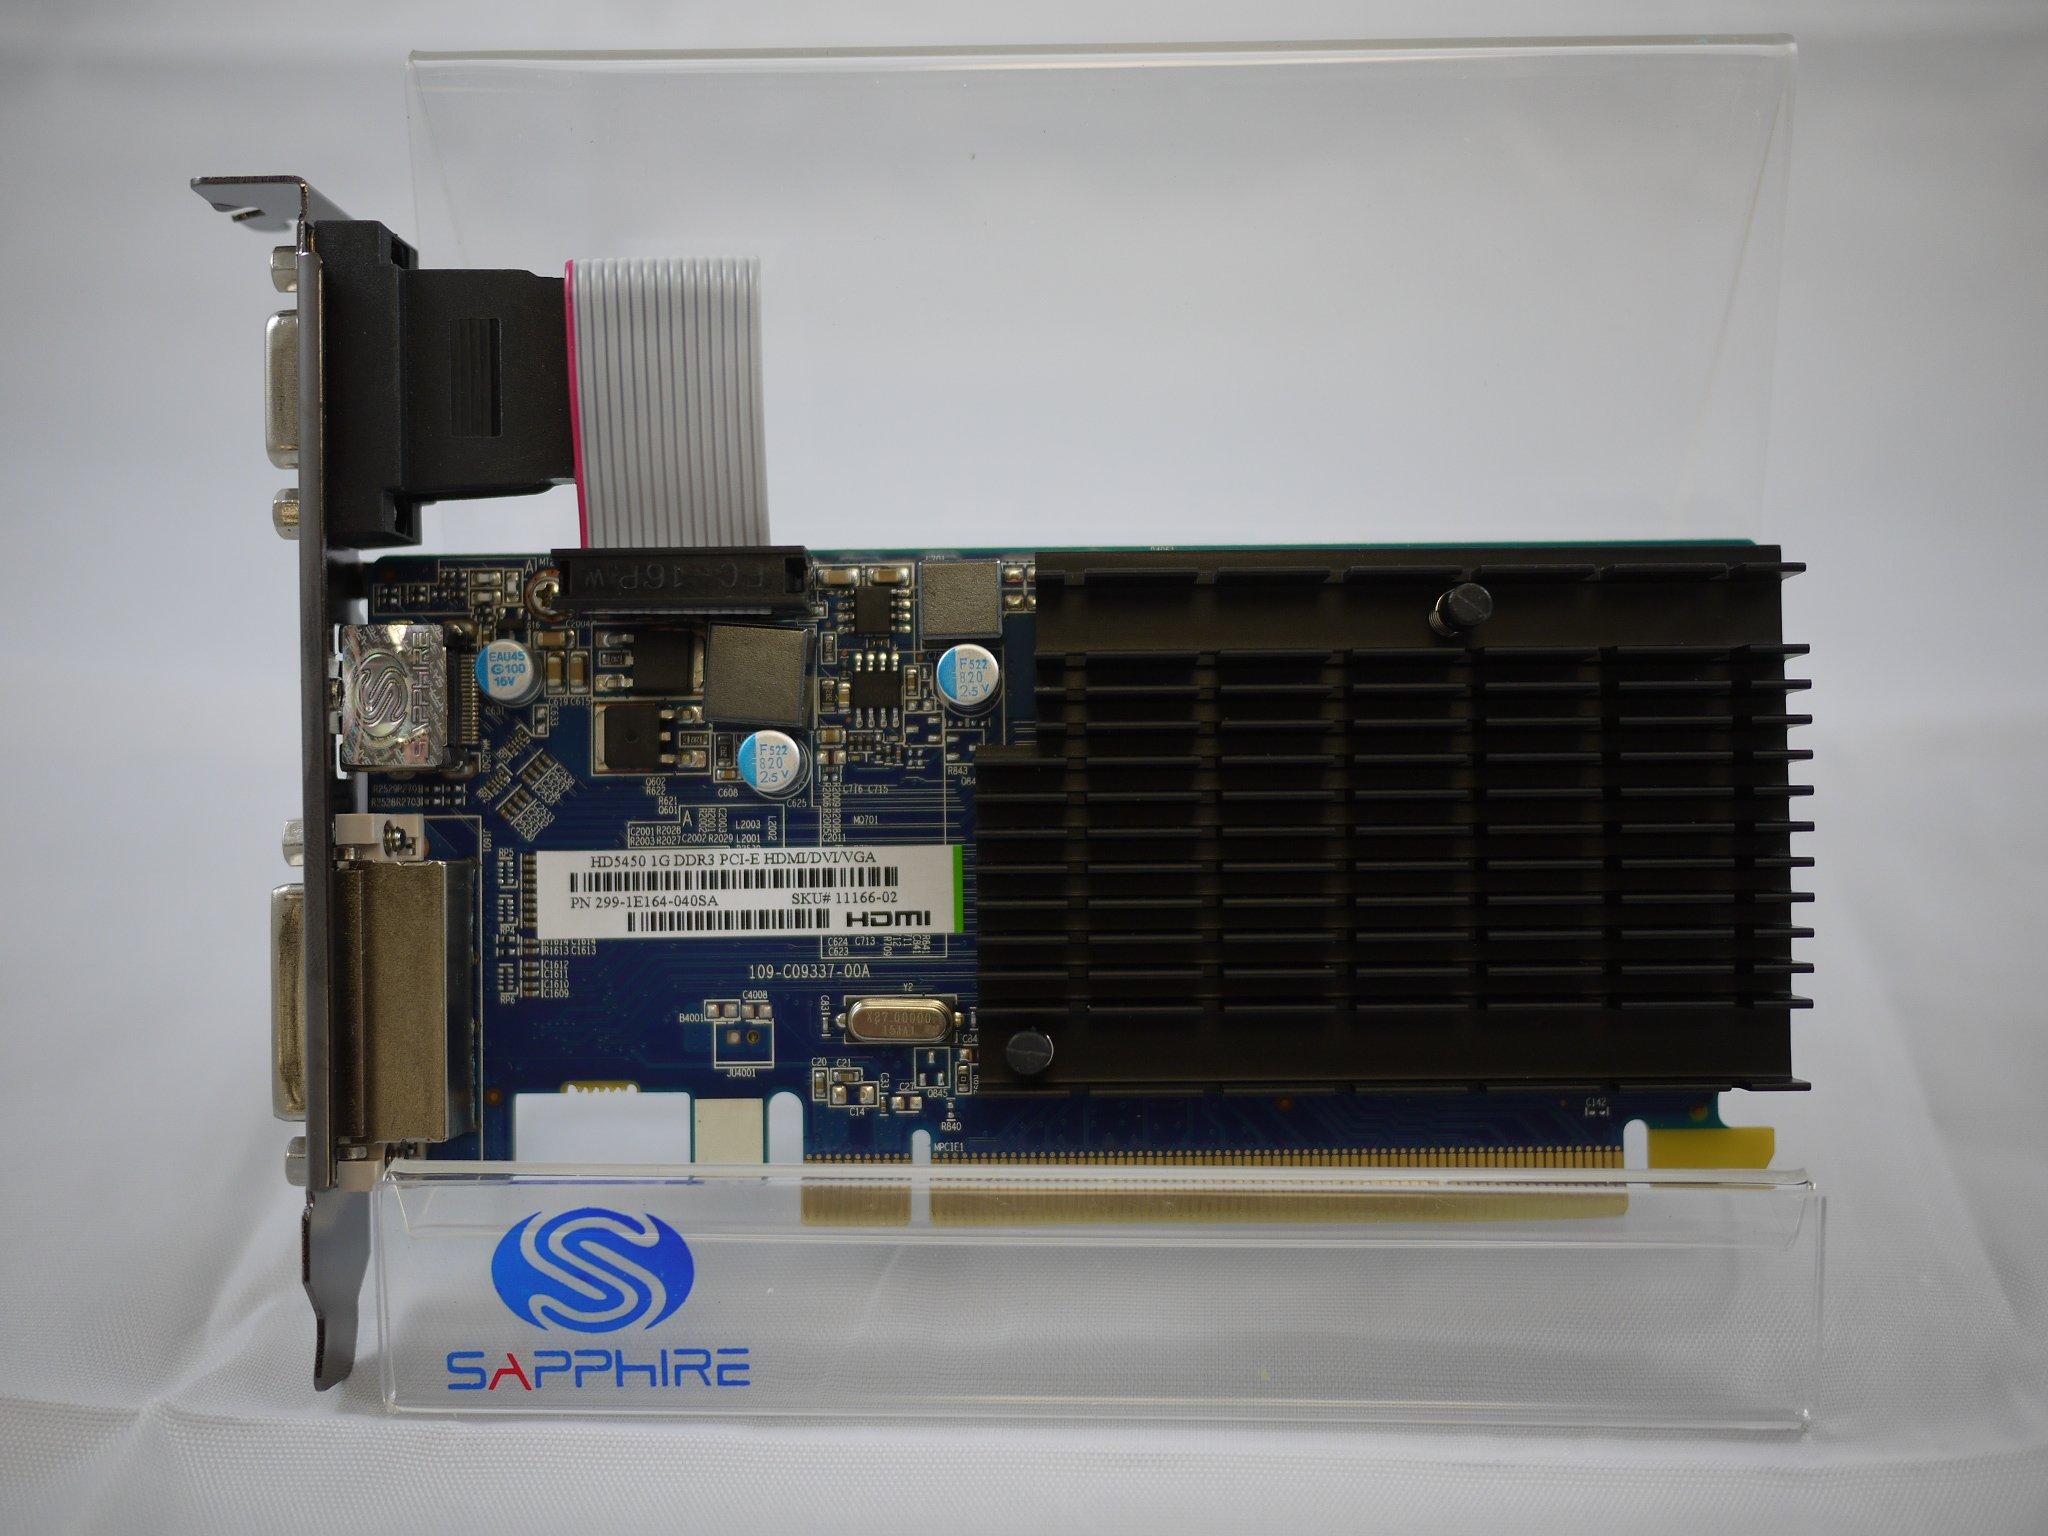 Sapphire Radeon HD 5450 1 GB DDR3 HDMI/DVI-D/VGA PCI-Express Graphics Card 100292DDR3L by Sapphire Technology (Image #3)